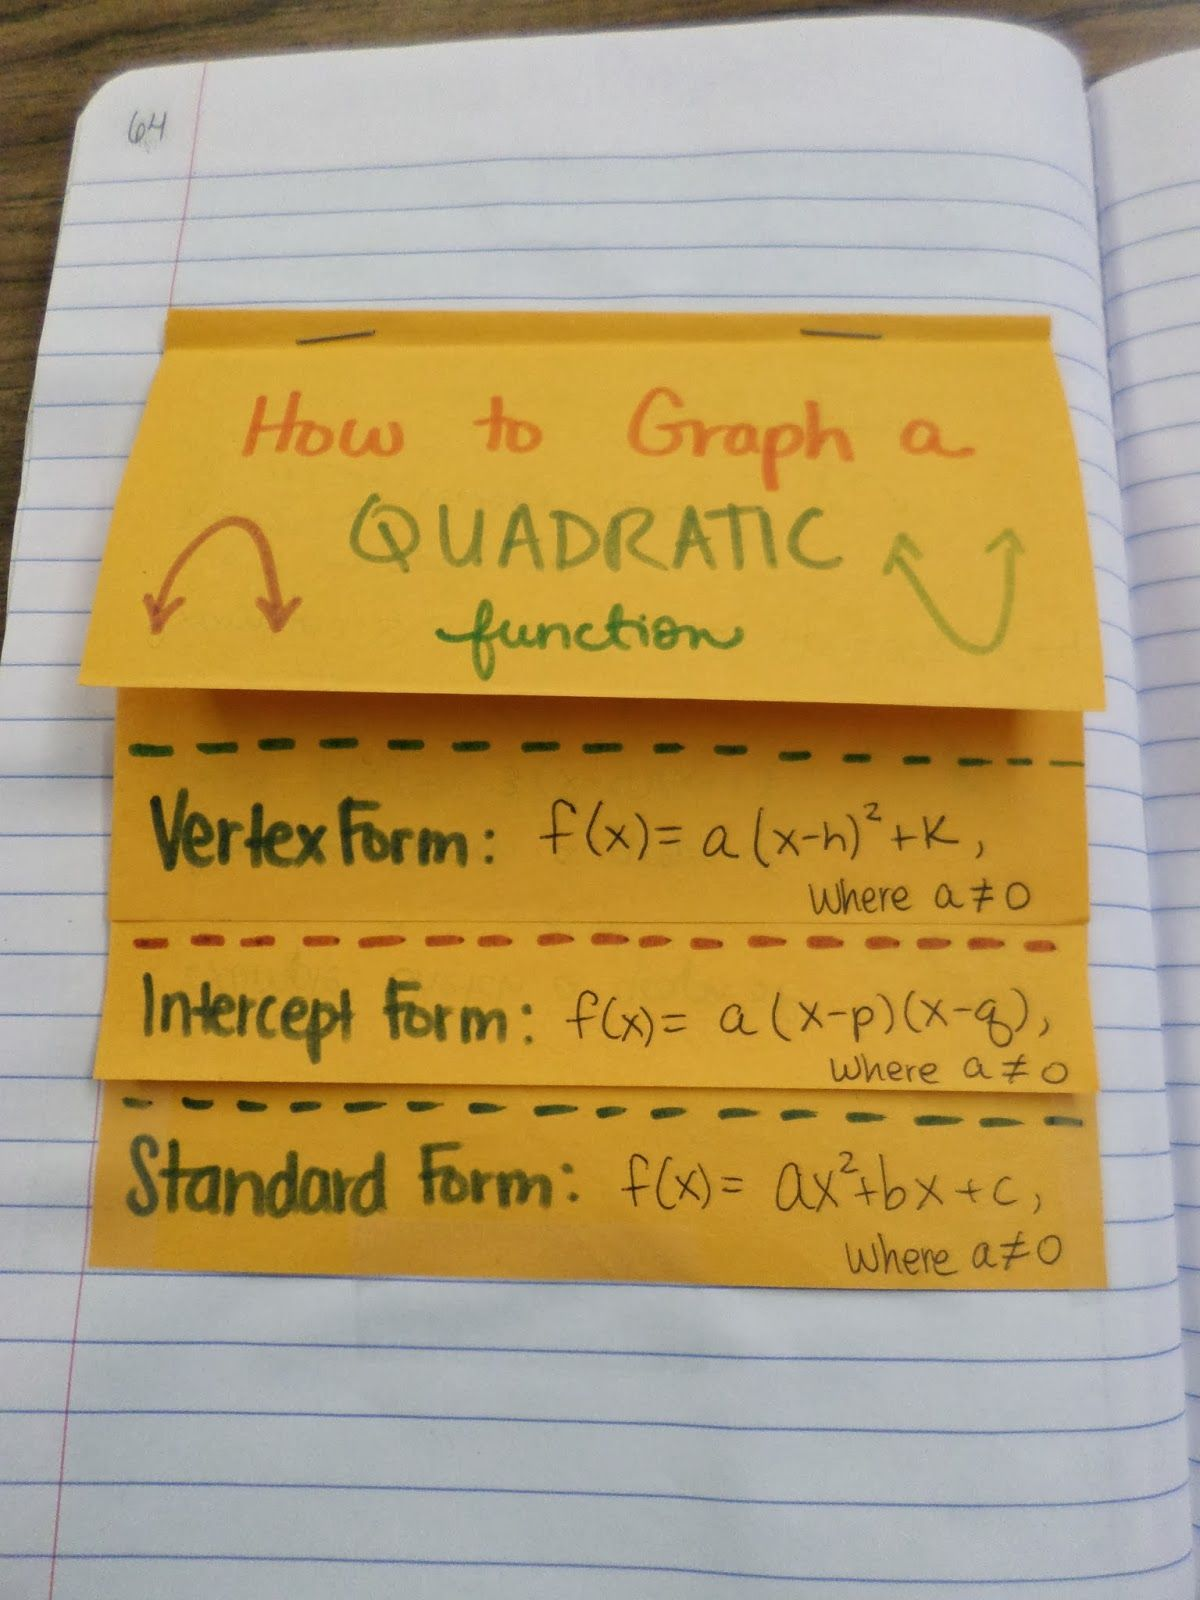 Sketching Quadratics